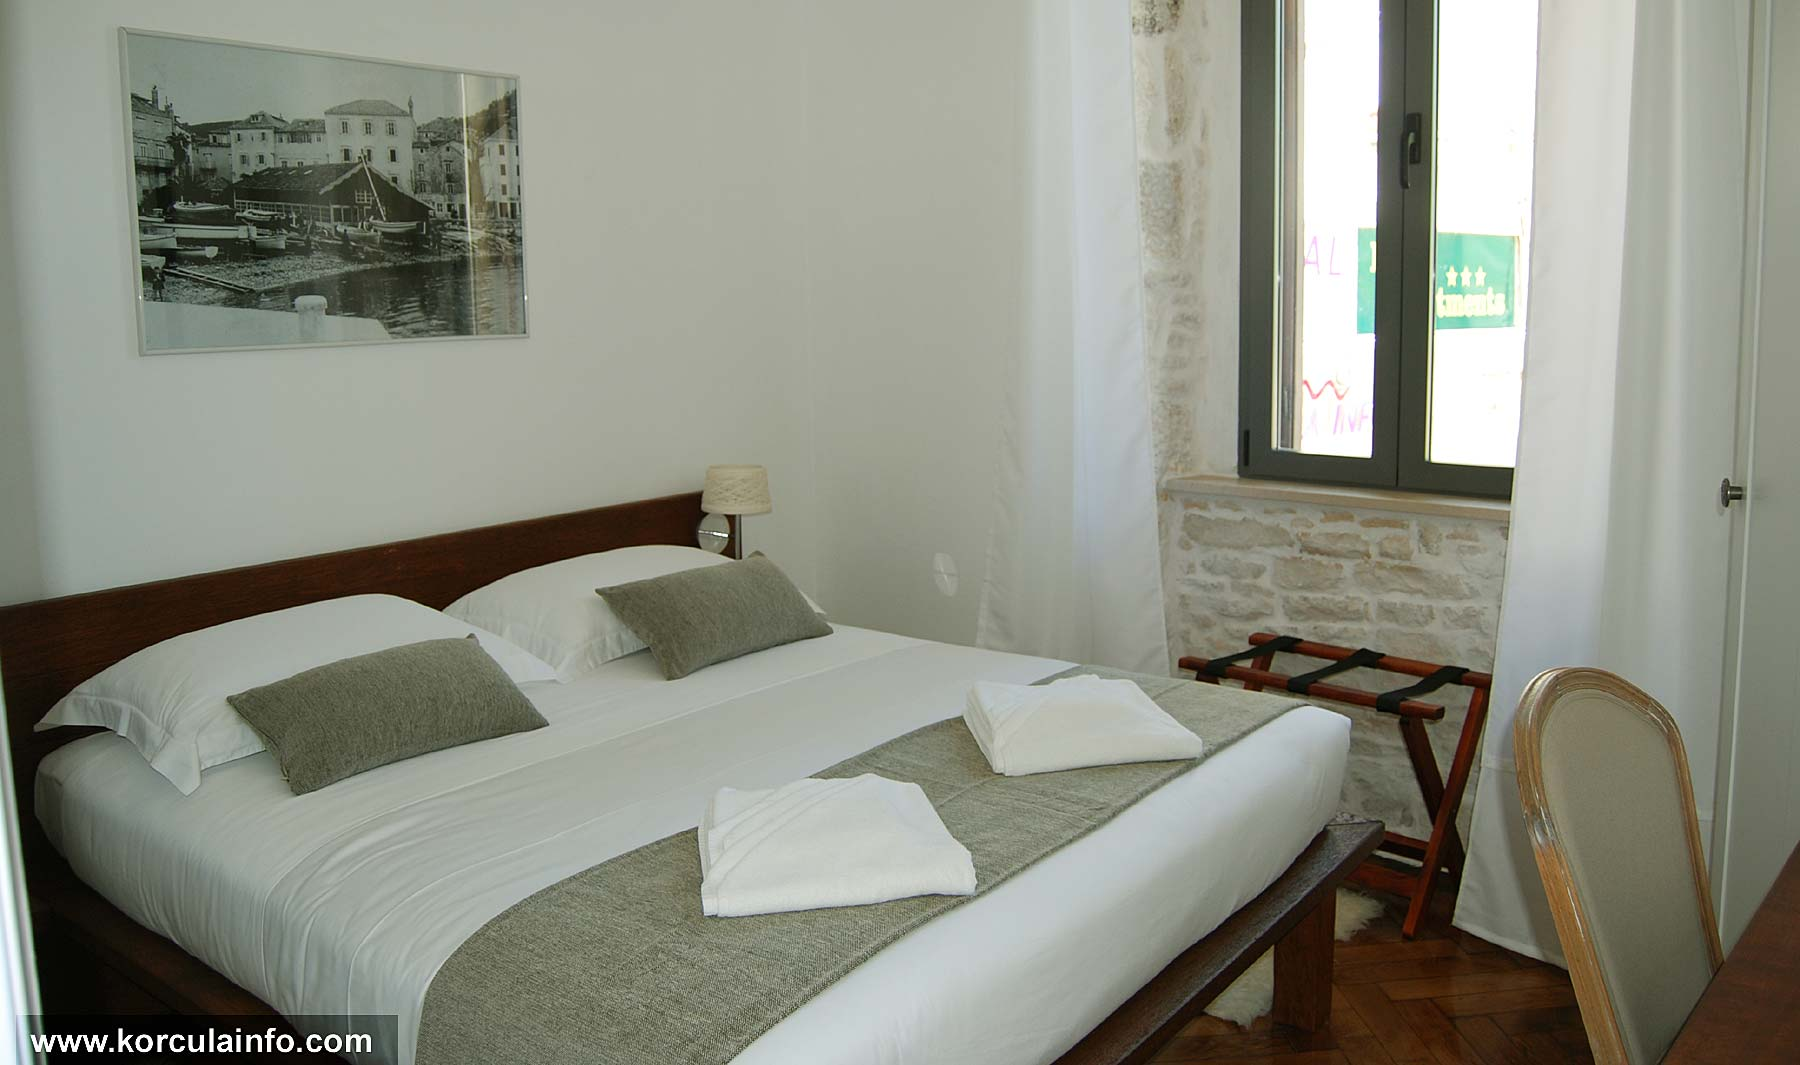 First Floor room with sea views - Hotel Fabris, Korcula